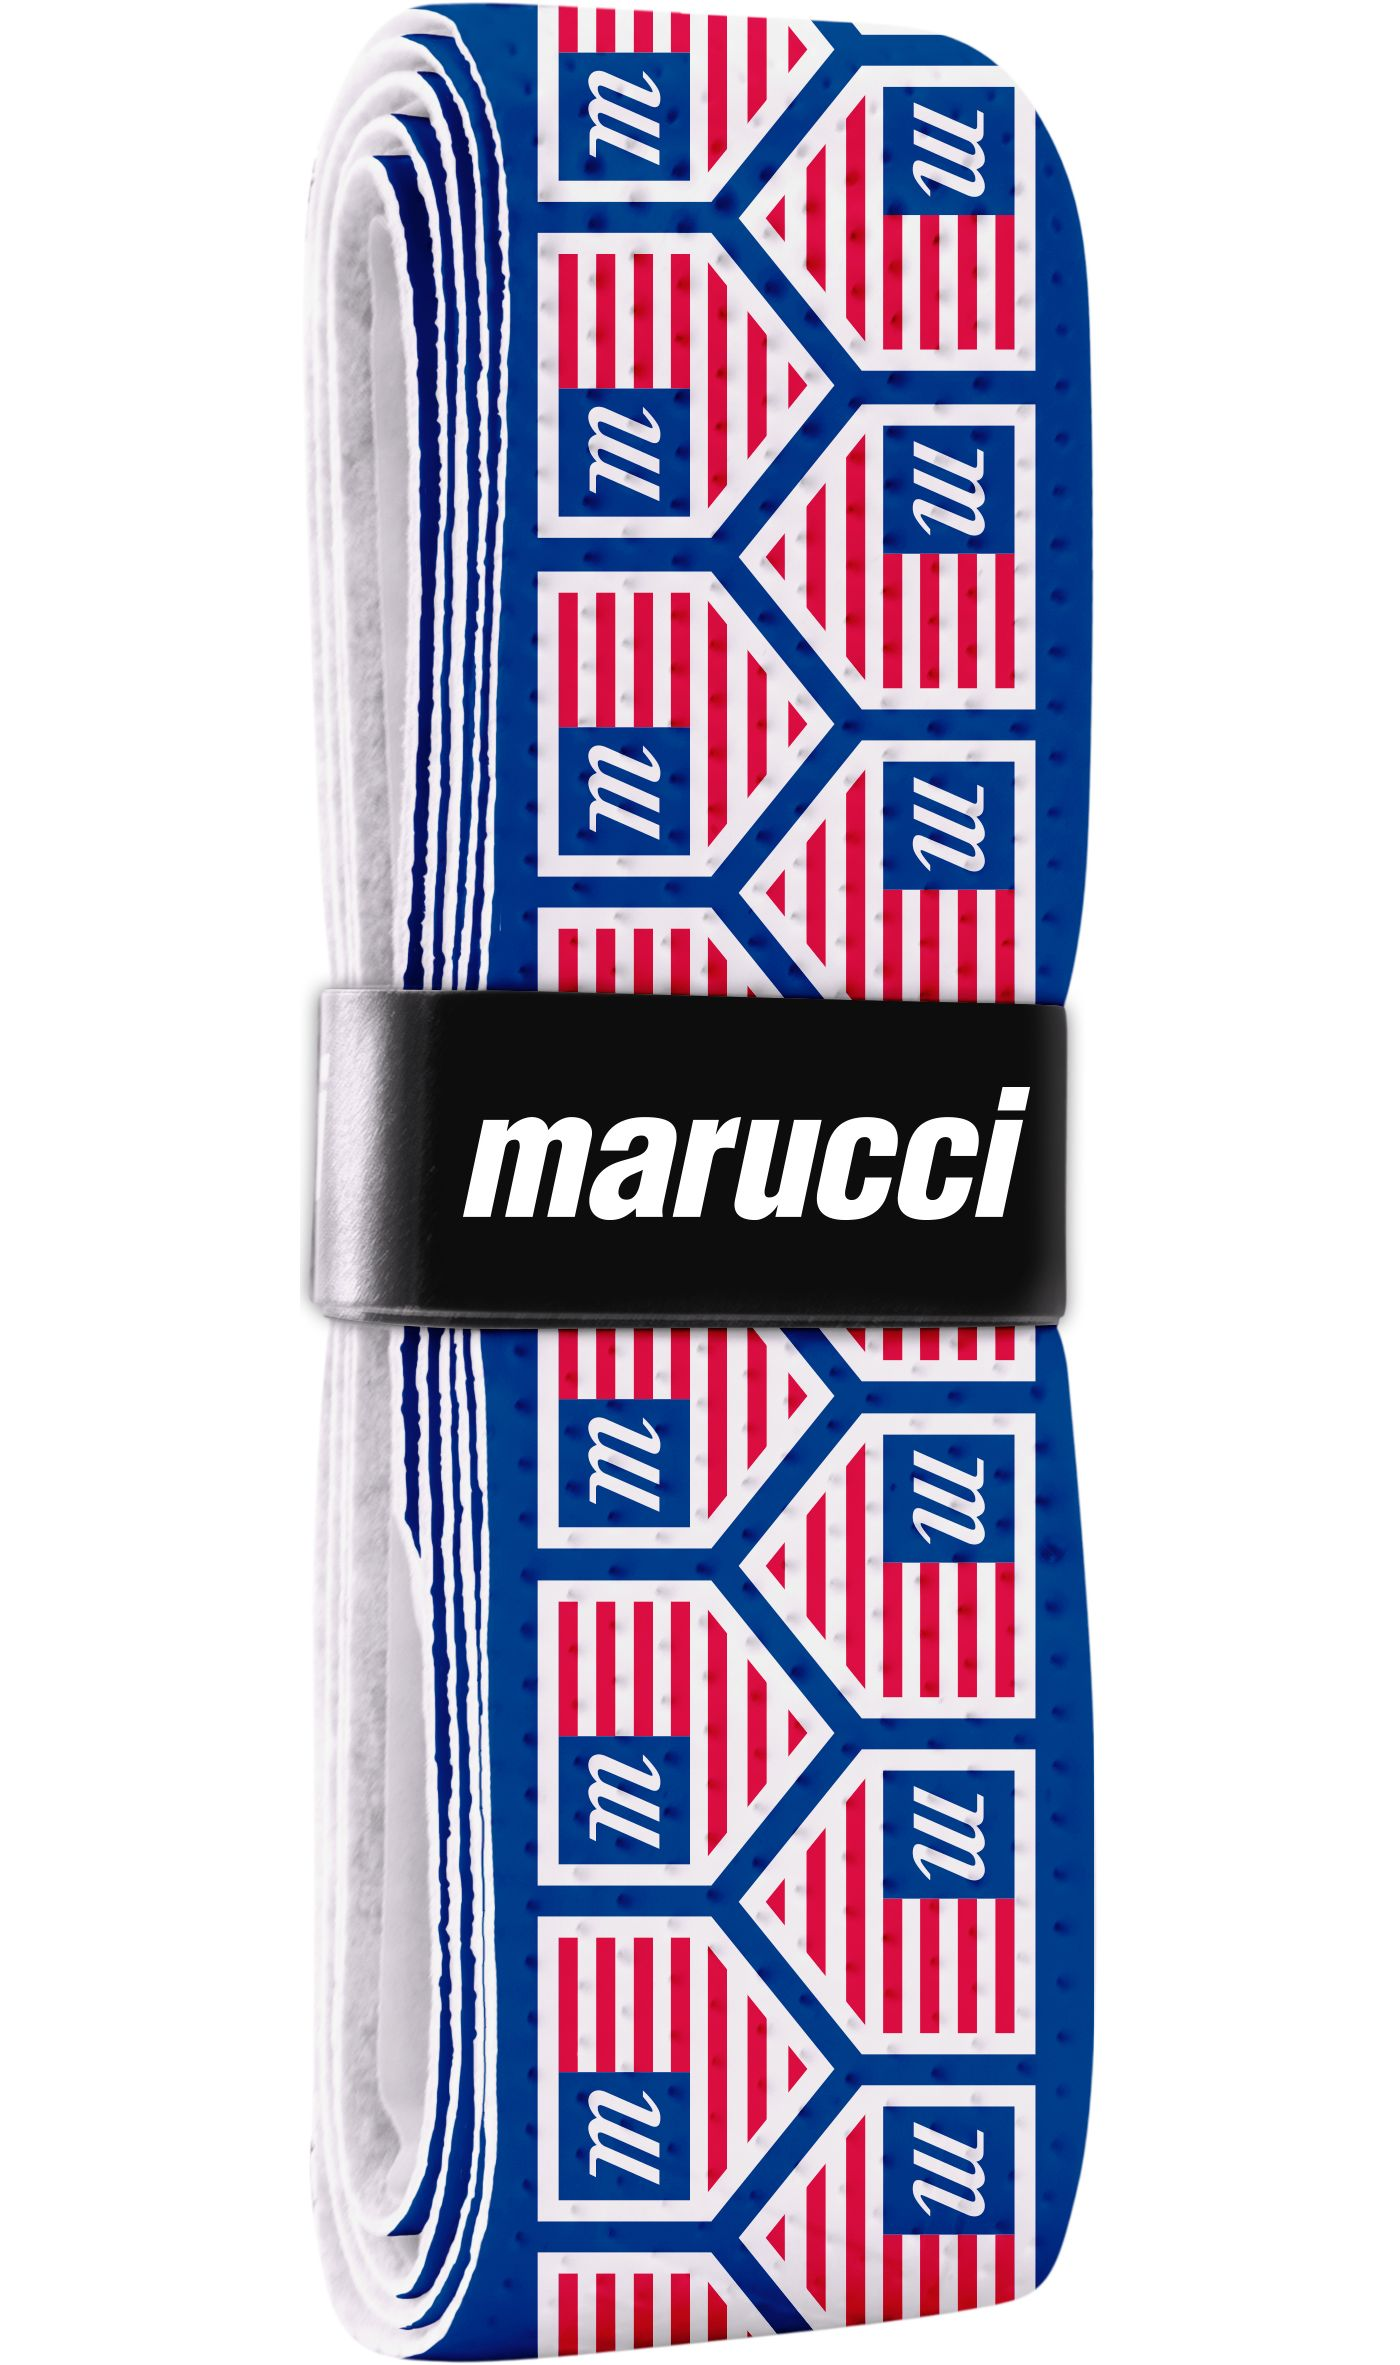 Marucci 0.5mm Bat Grip